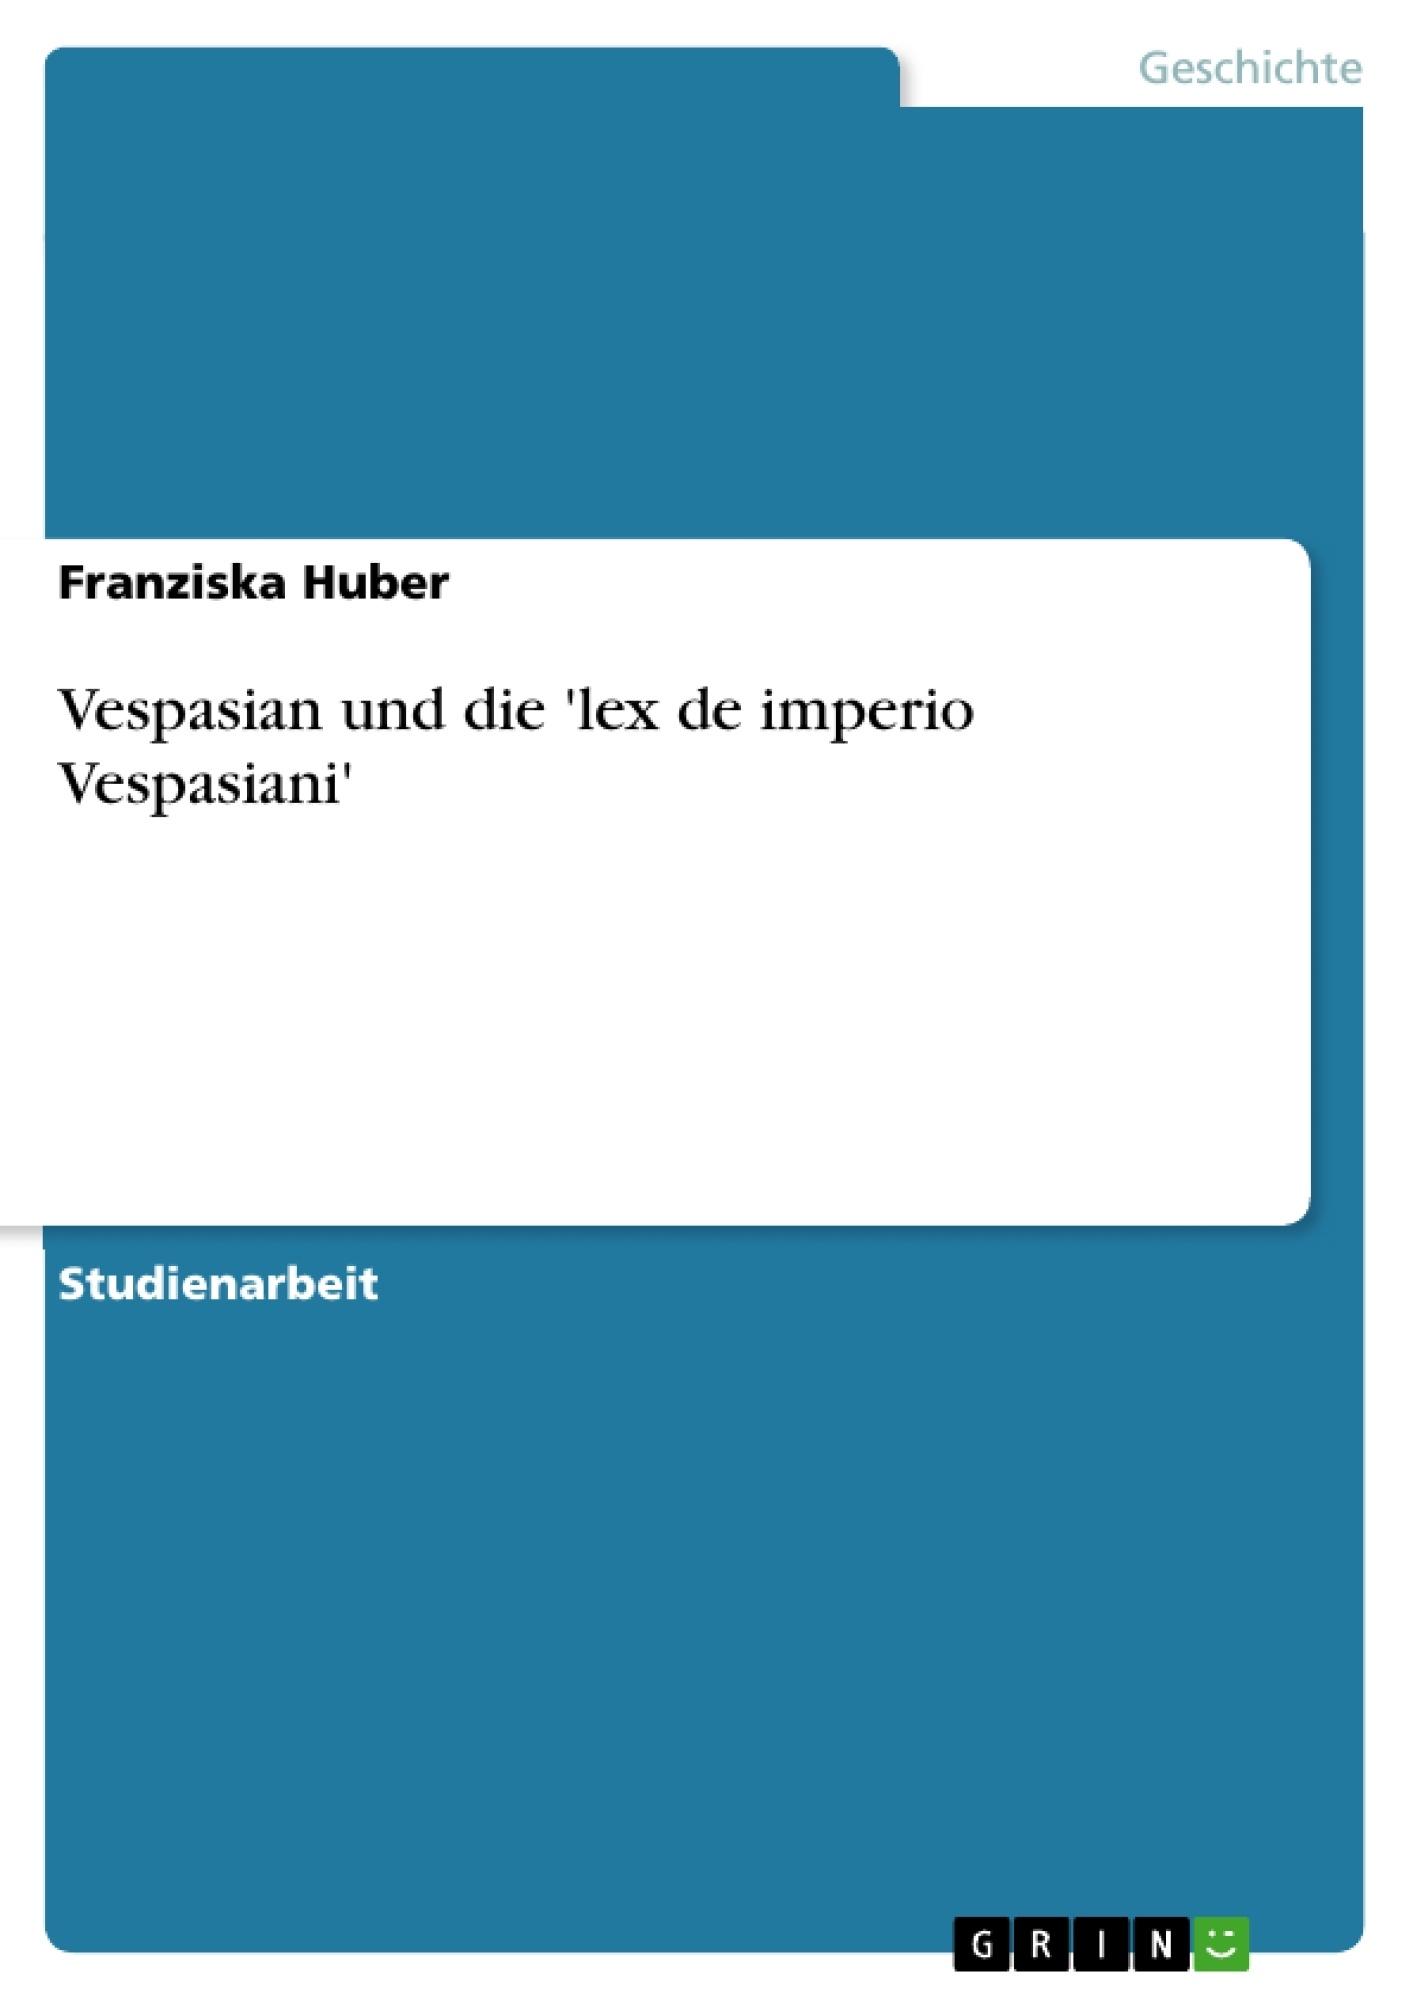 Titel: Vespasian und die 'lex de imperio Vespasiani'